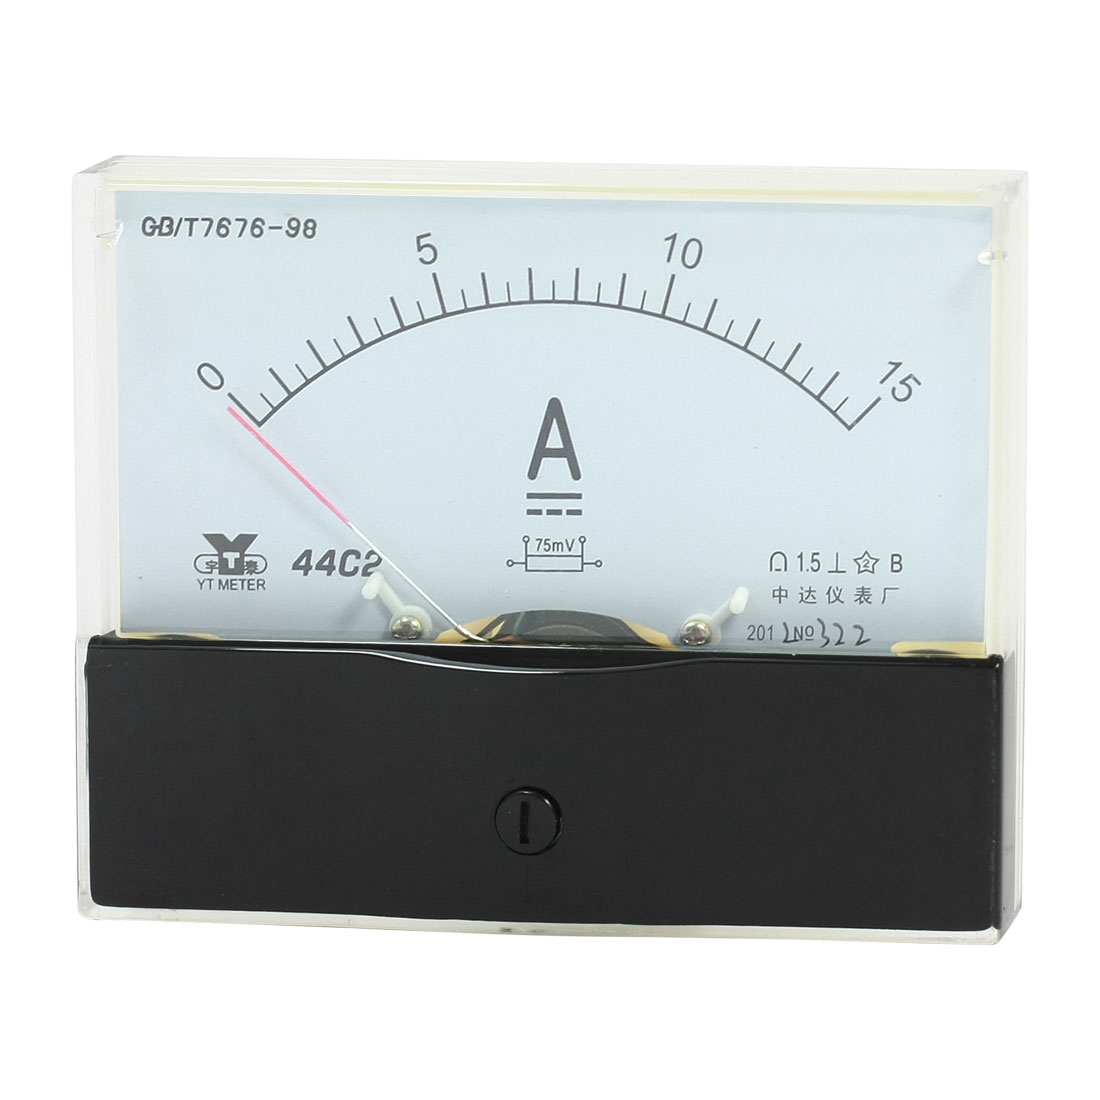 Rectangle Measurement Tool Analog Panel Ammeter Gauge DC 0 - 15A Measuring Range 44C2